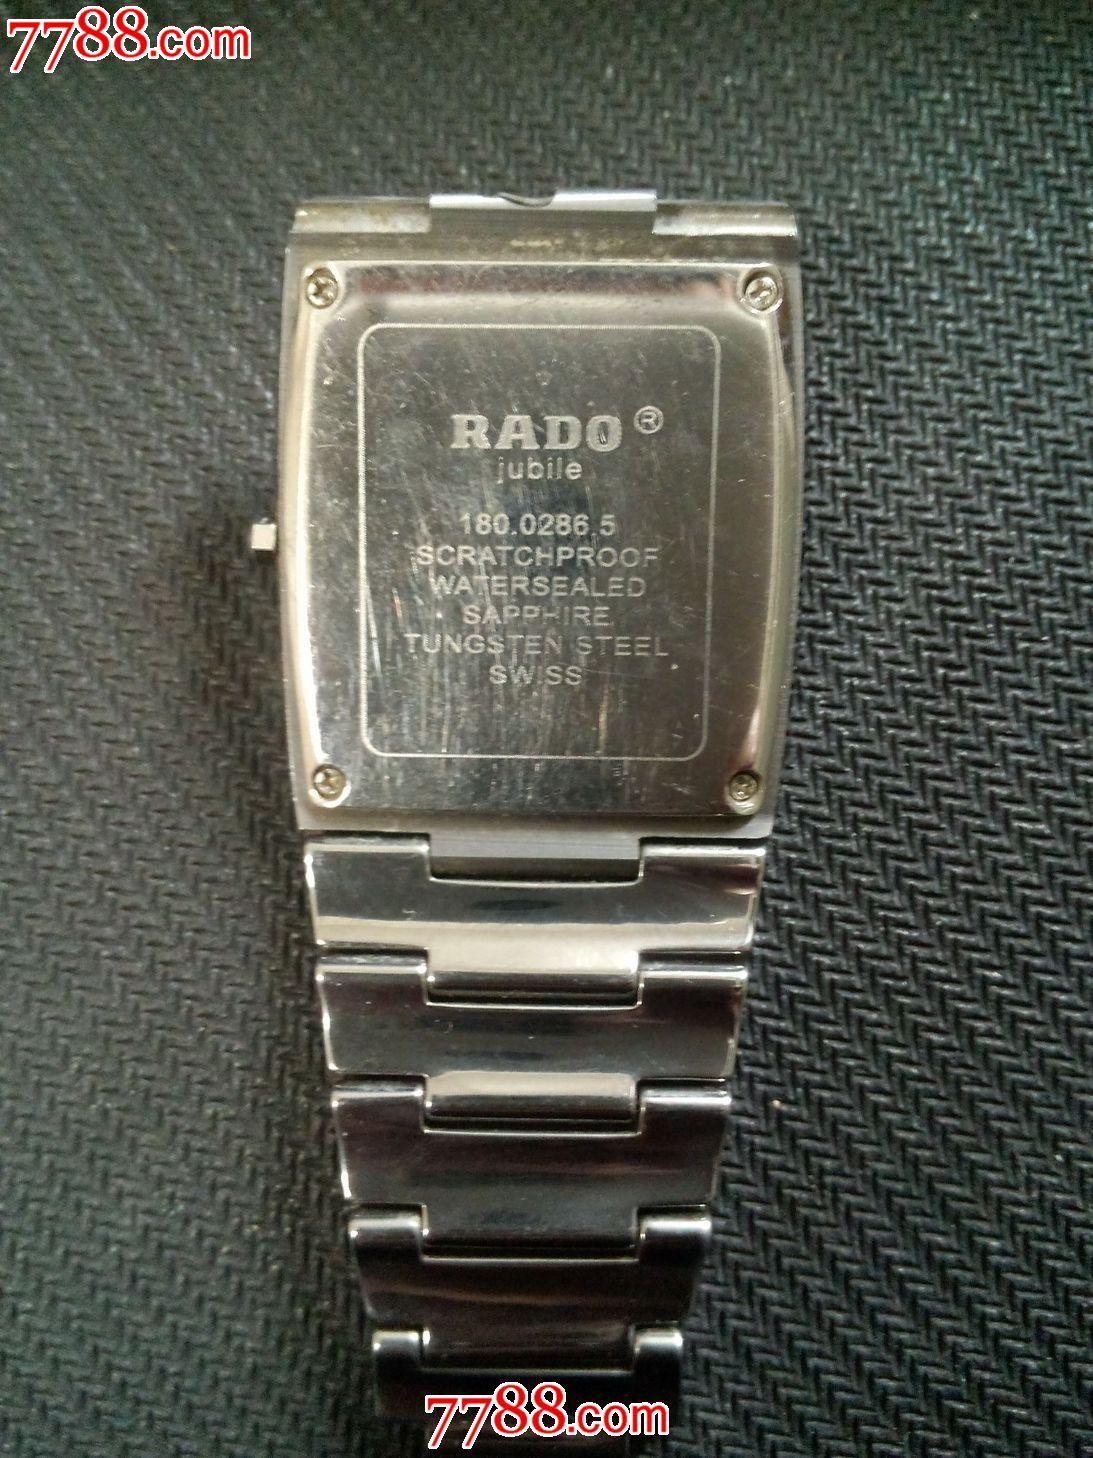 radojubile系列_雷达rado钨钢jubile镶钻男一块